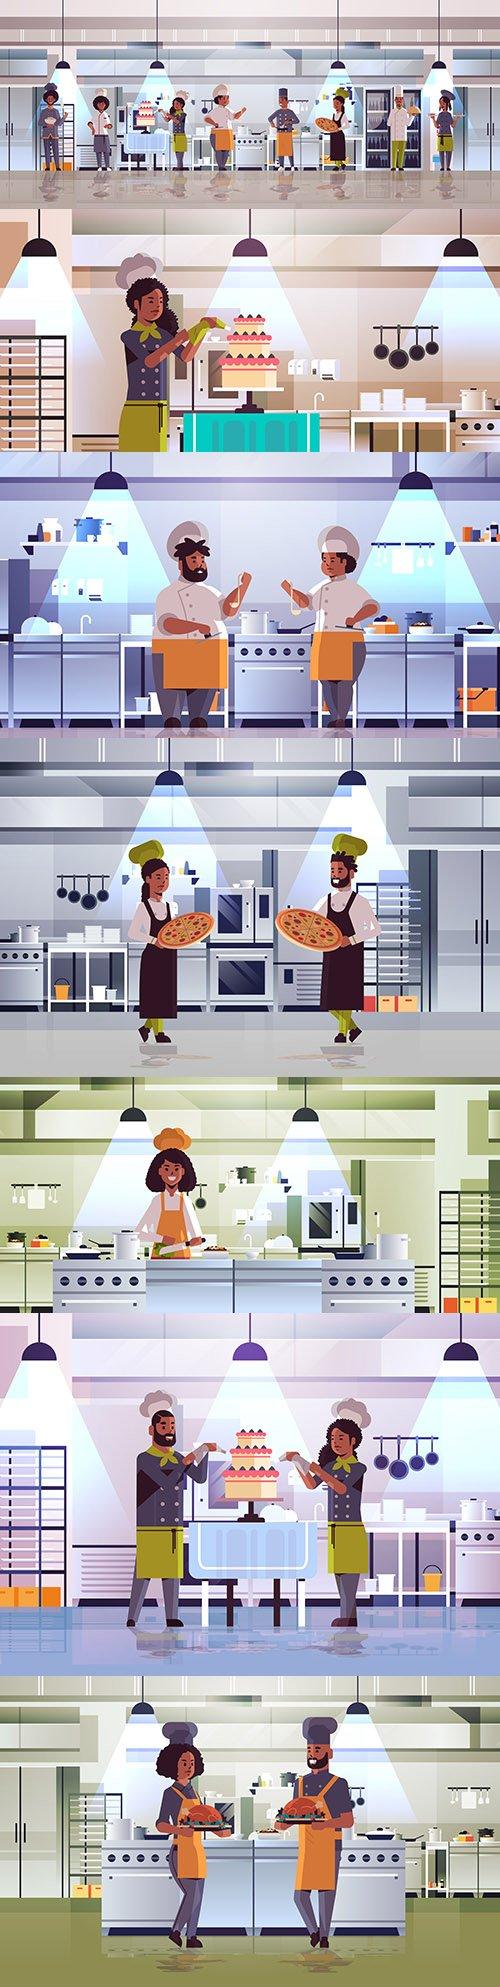 Chef tasting dishes modern cuisine interior flat design